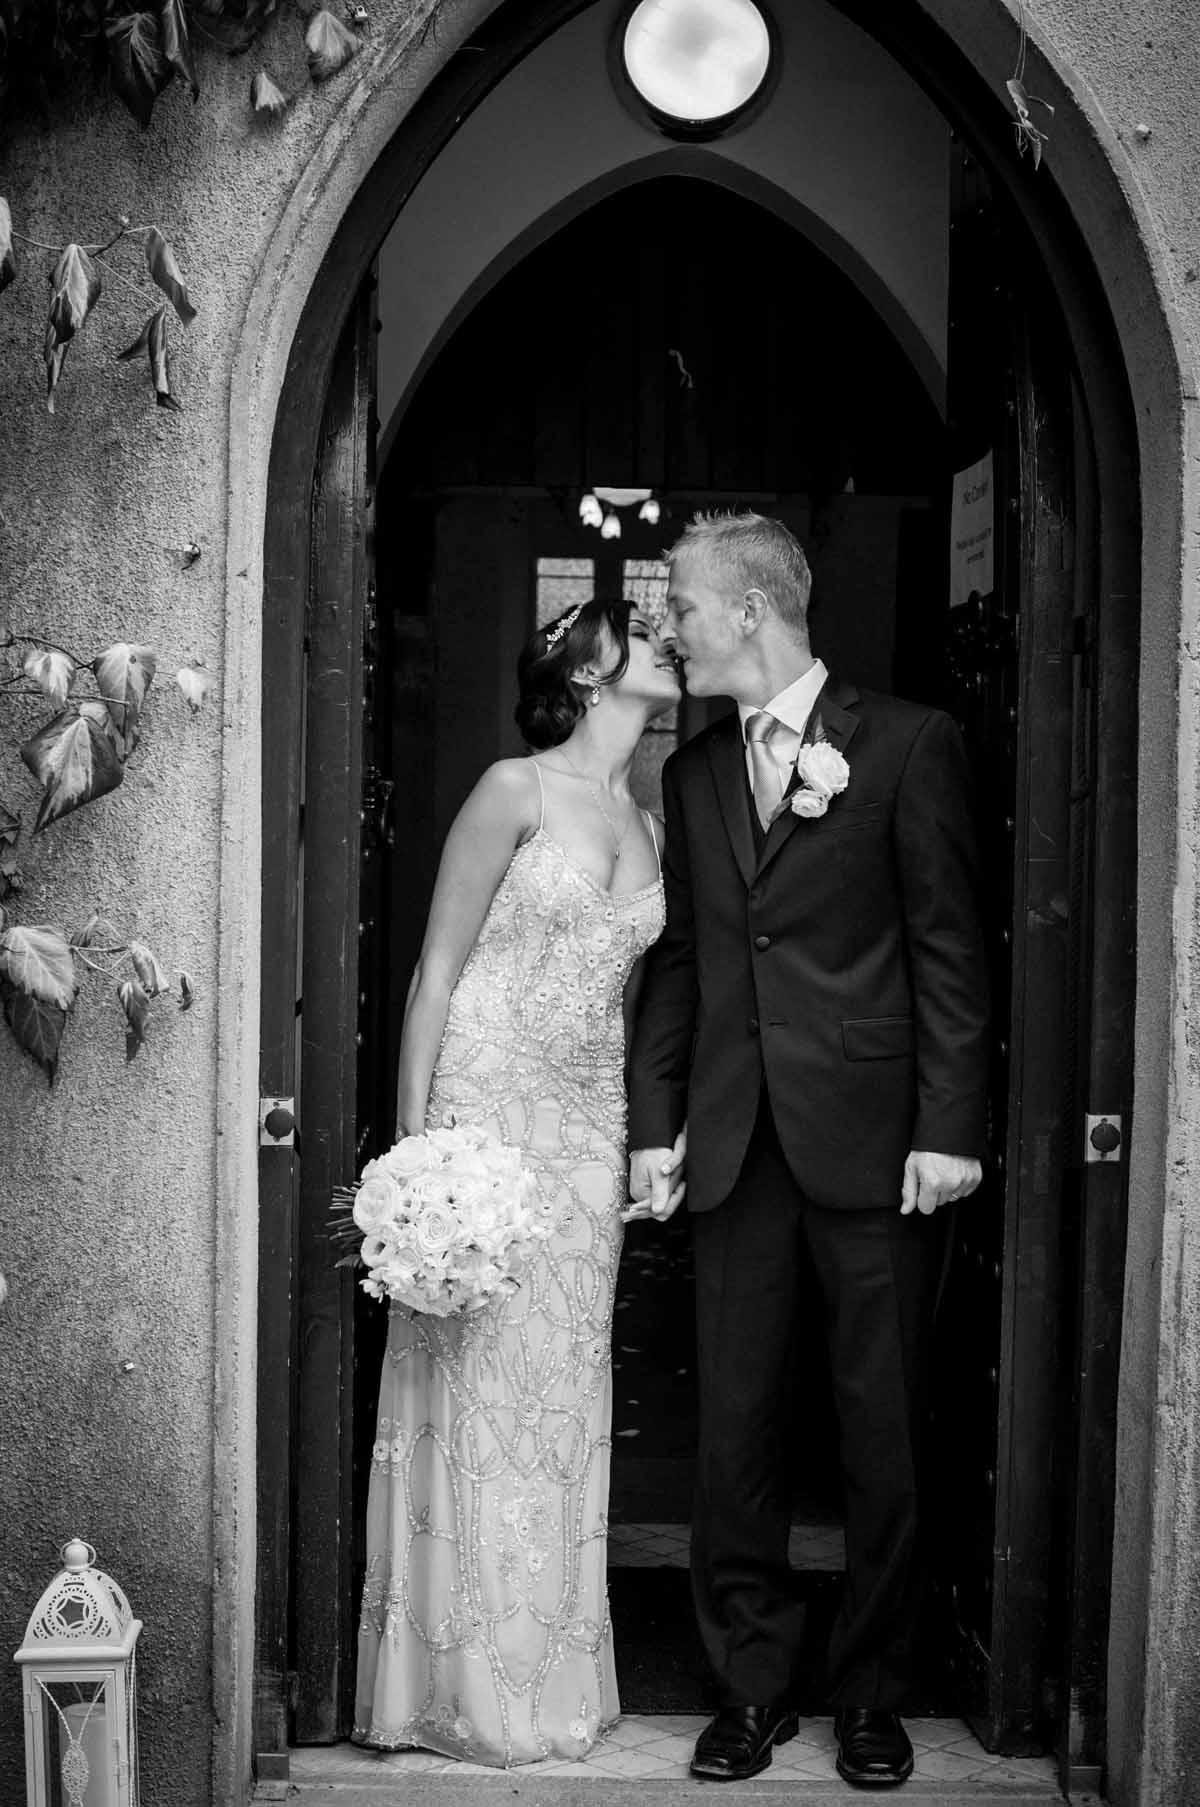 BrookLodge Chapel Wedding Photo